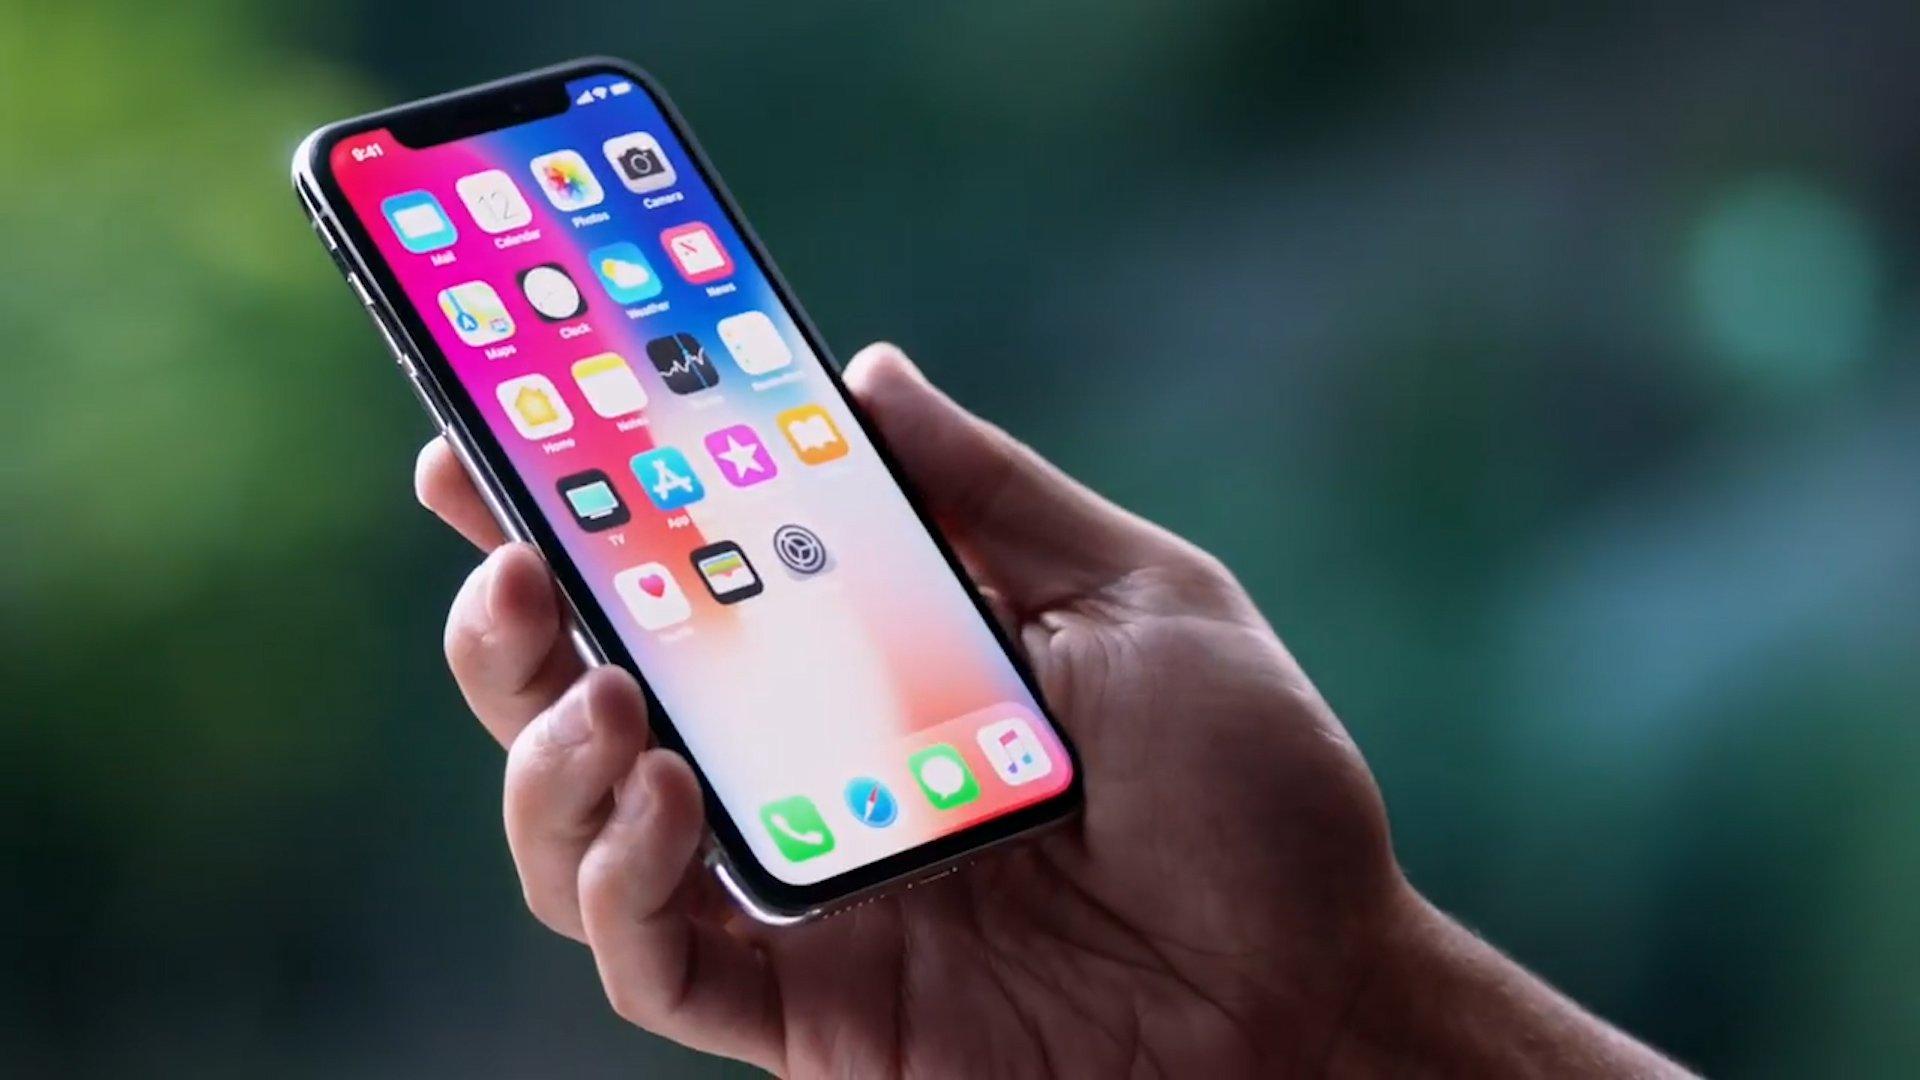 Hands on with the iPhone X https://t.co/4SRHefBZay #AppleEvent https://t.co/J8Ko55cvU7